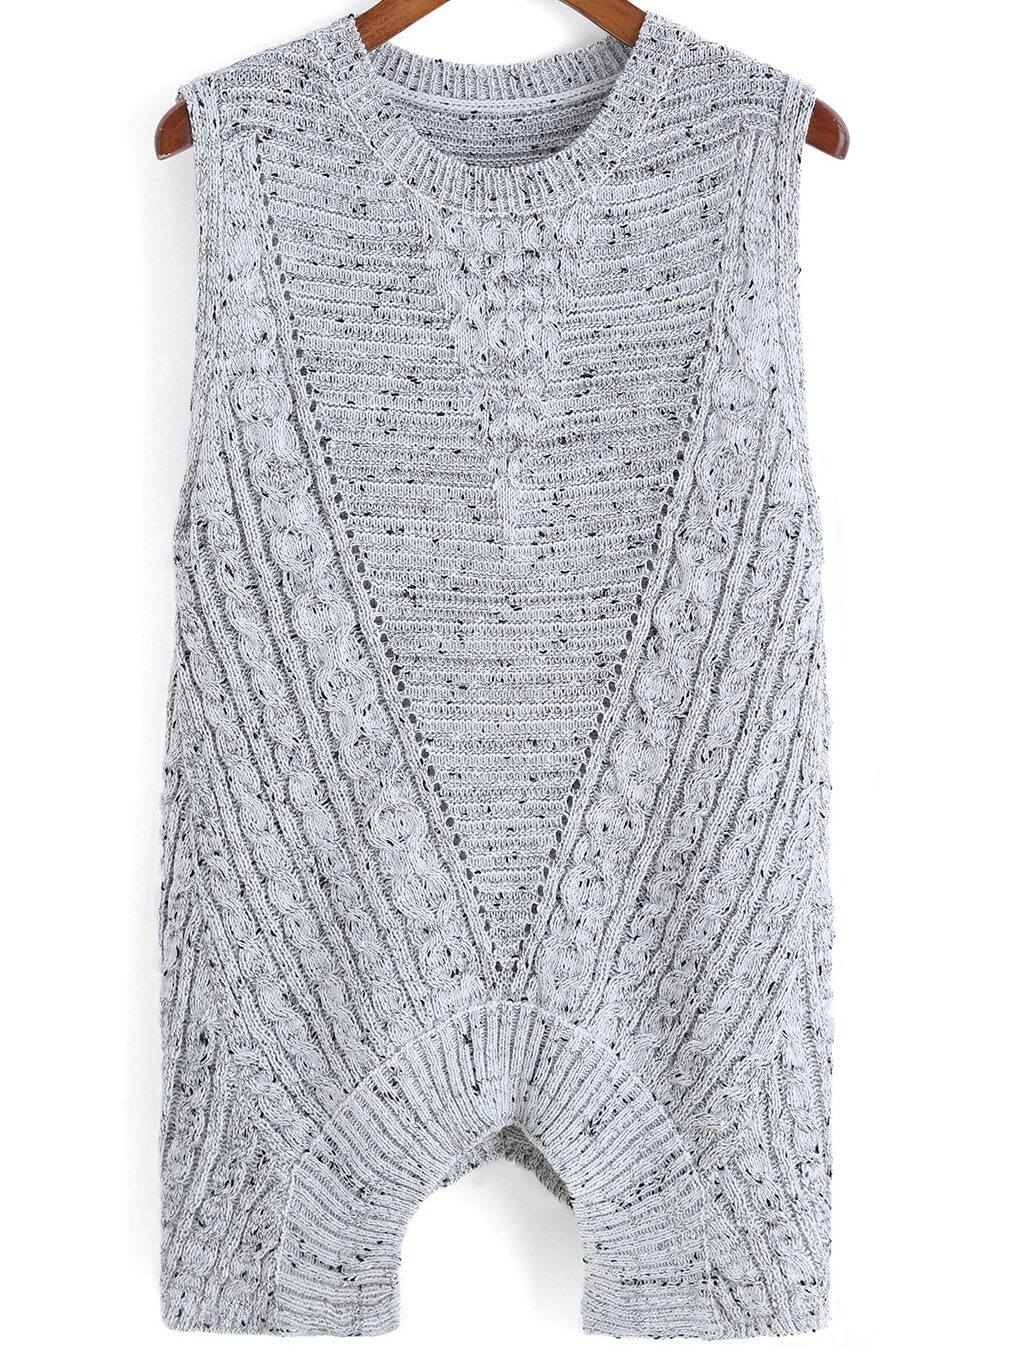 Grey Round Neck Backless Knit Sweater -SheIn(Sheinside)